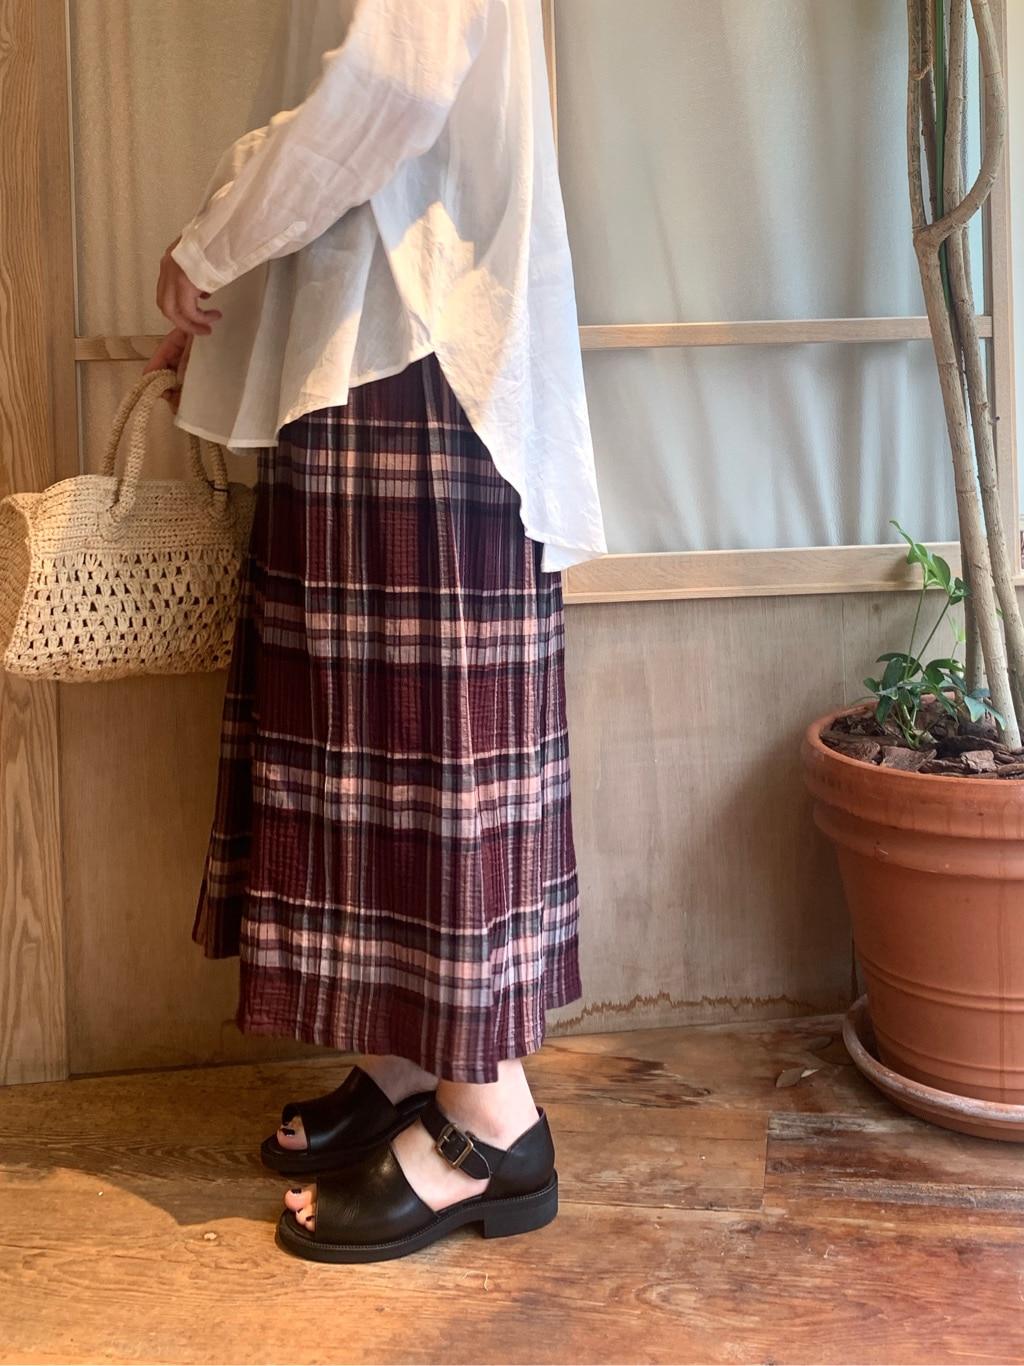 bulle de savon 新宿ミロード 身長:159cm 2020.06.12